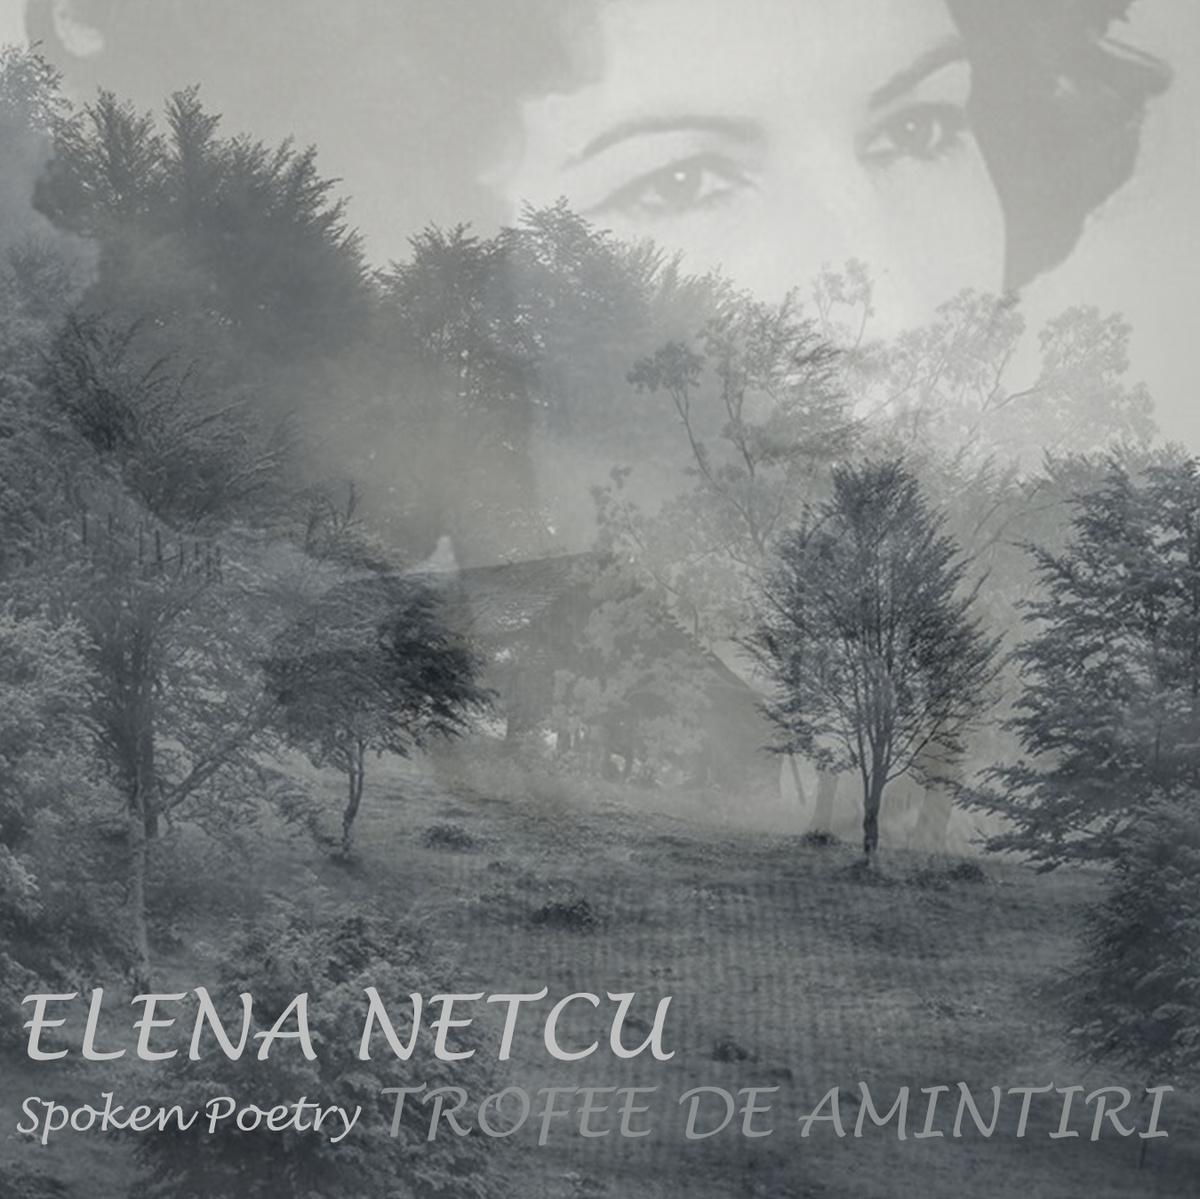 ELENA NETCU